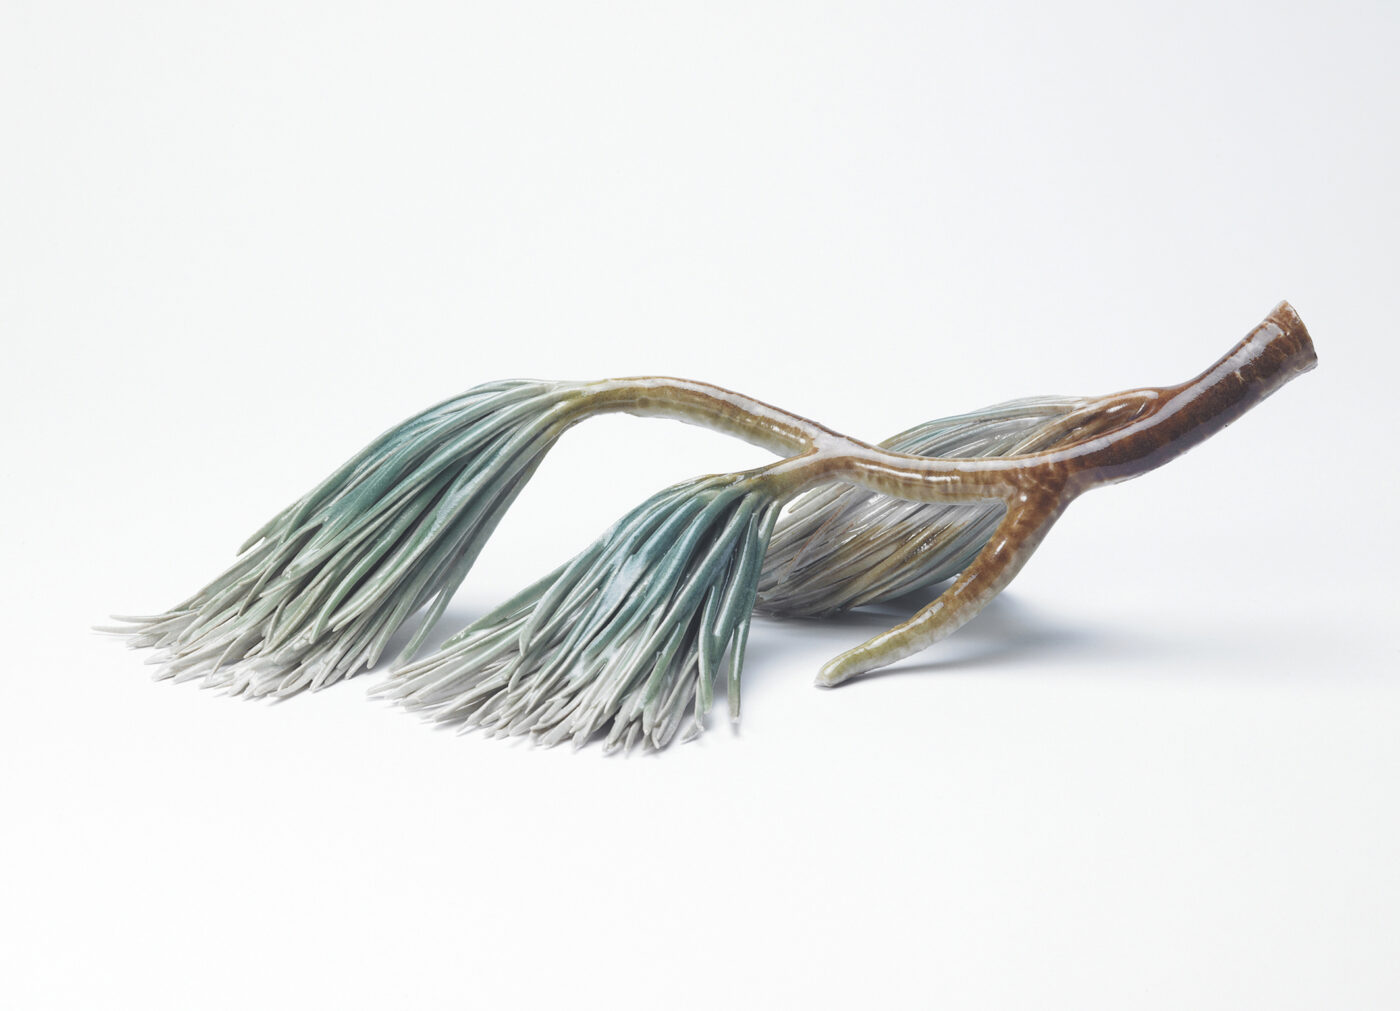 Keramiker Marianne Nielsen - Fyrregren, 2019, foto: Mads Hagedorn-Olsen